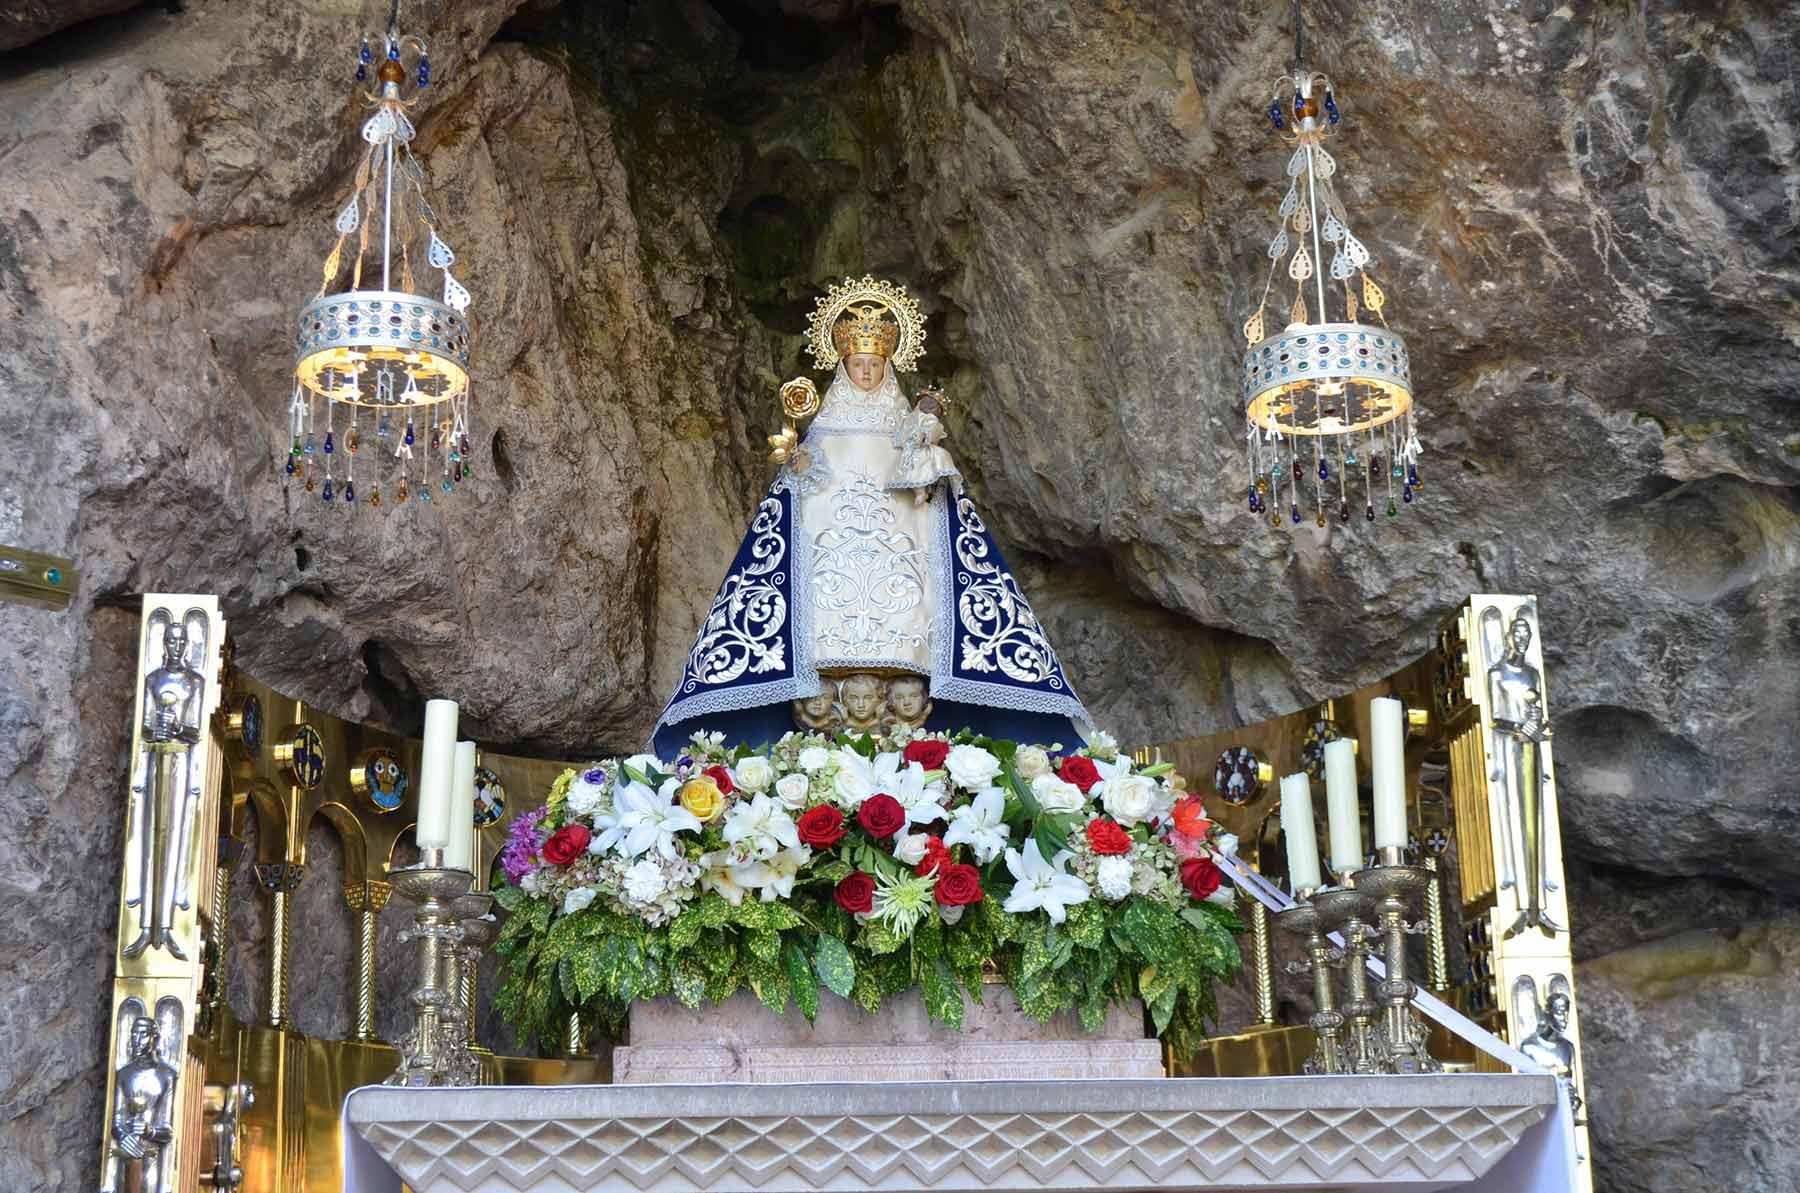 The Virgin of Covadonga